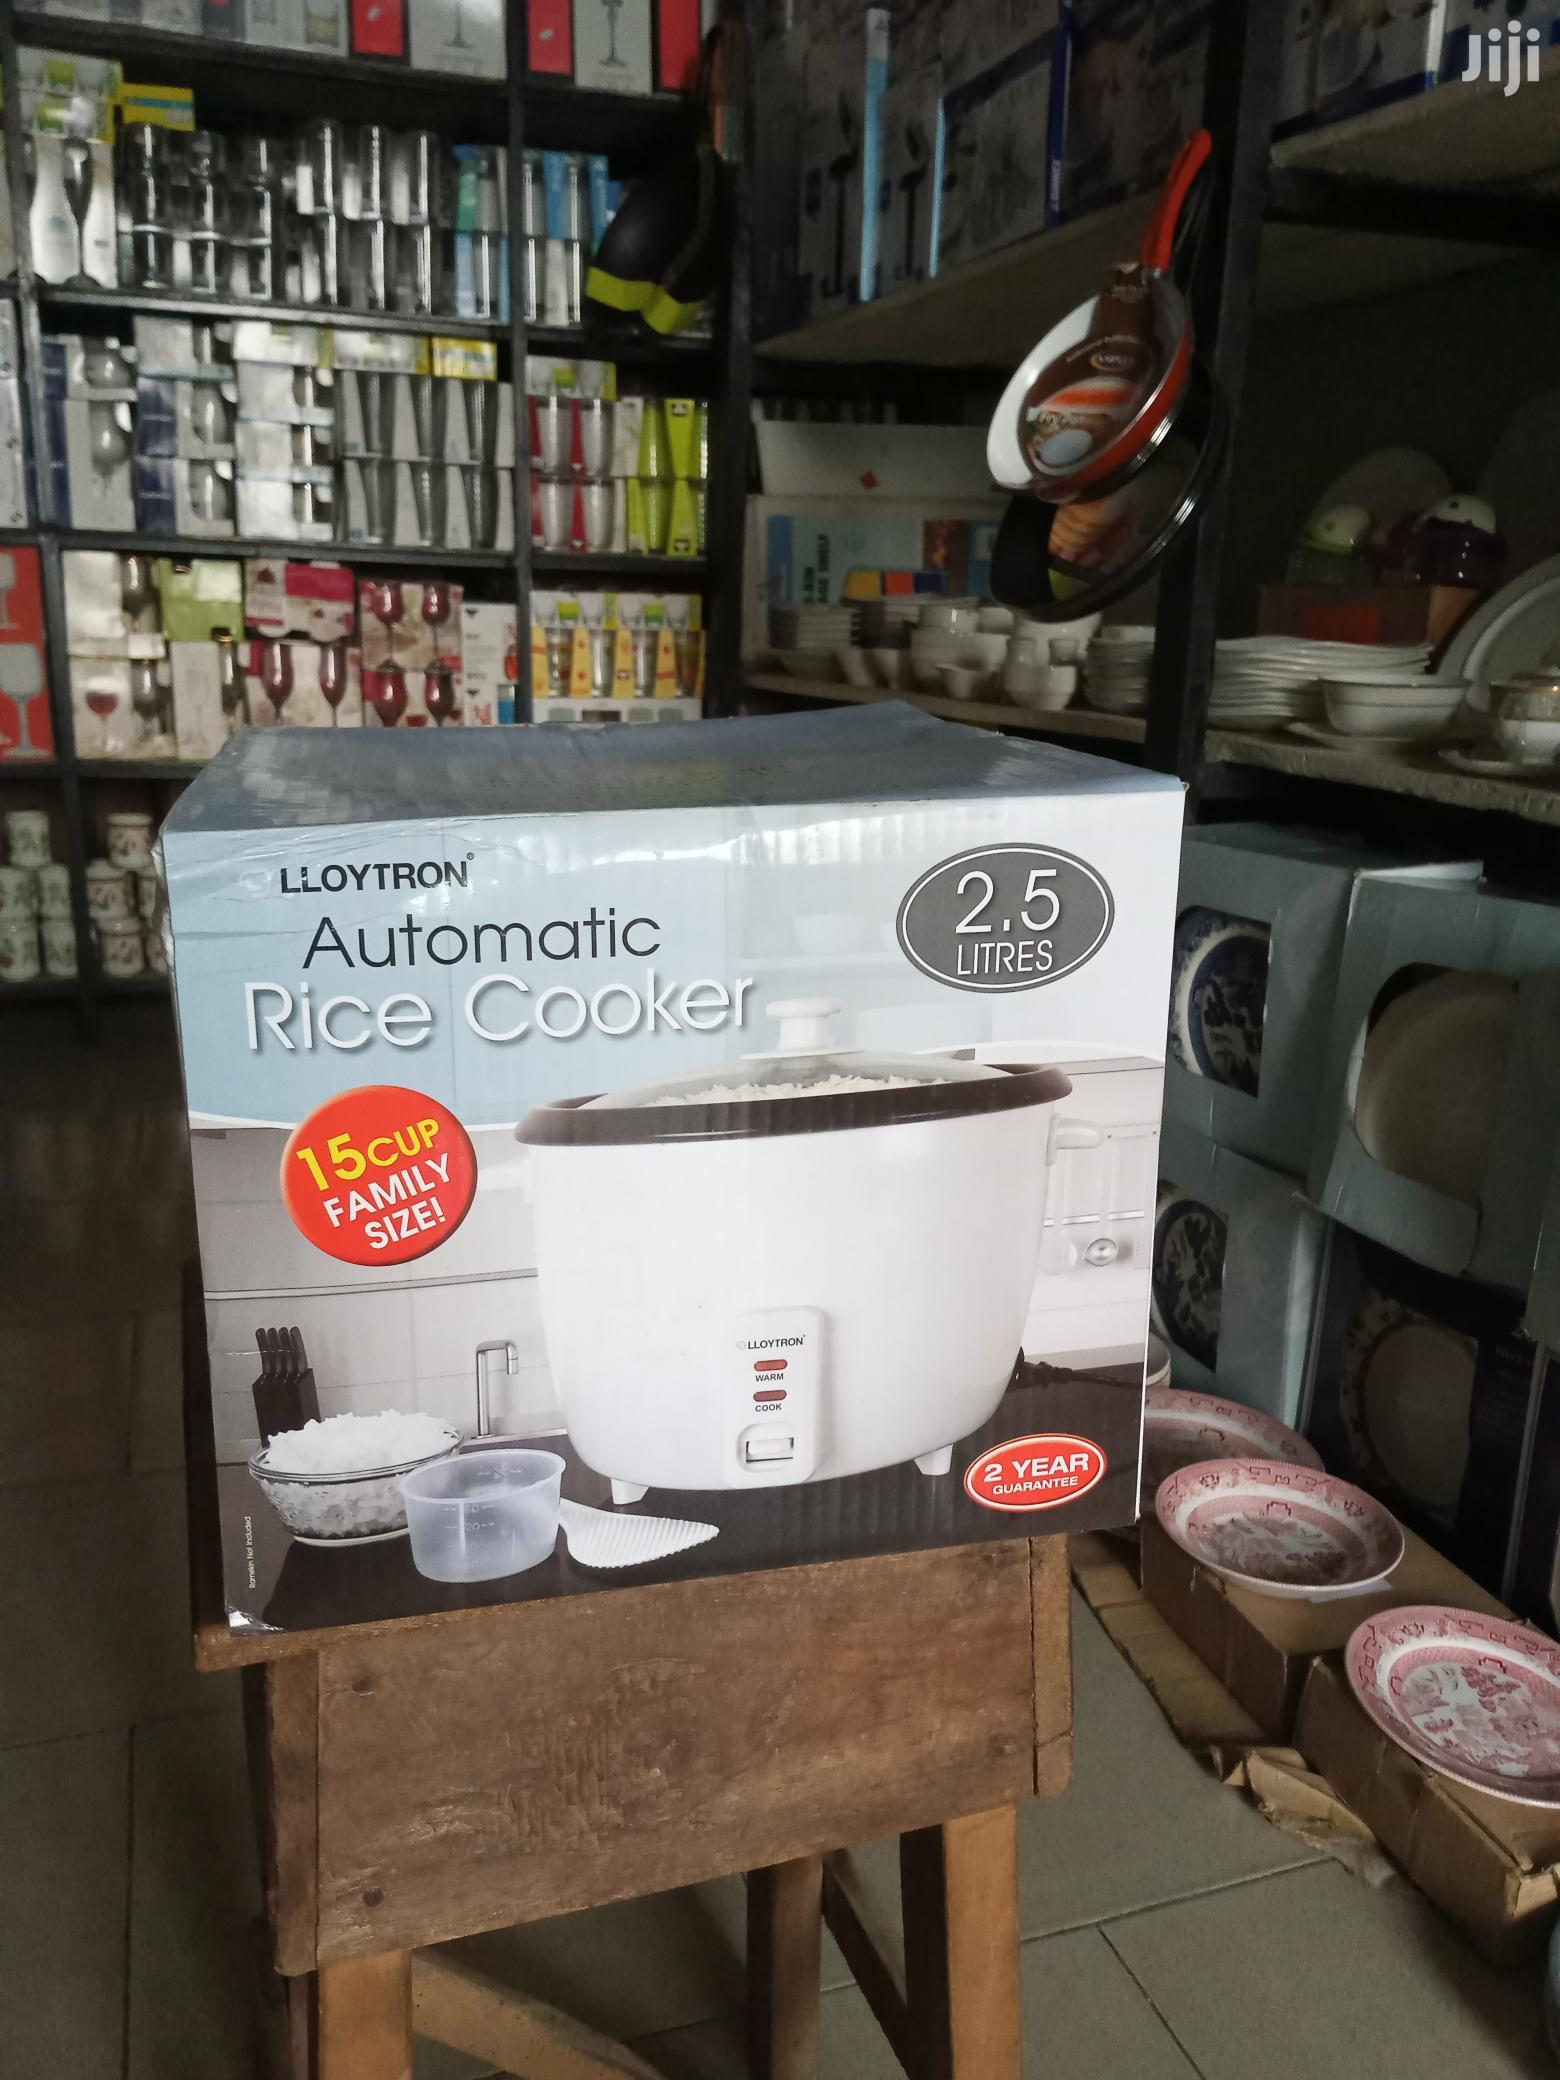 Lloytron Automatic Rice Cooker